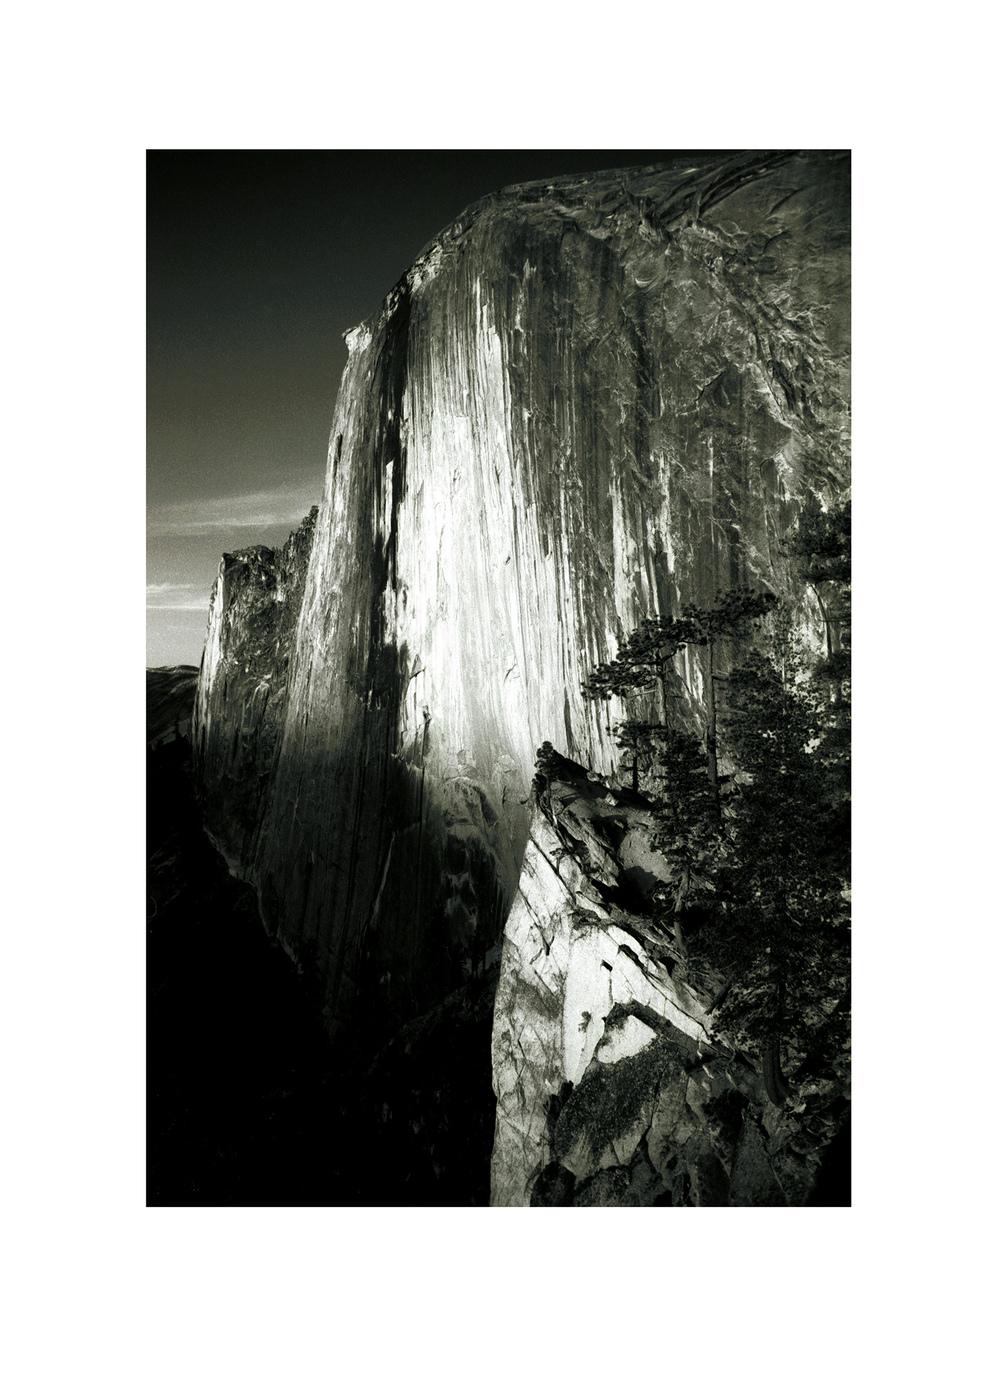 Matusik Travel-Nature 0043